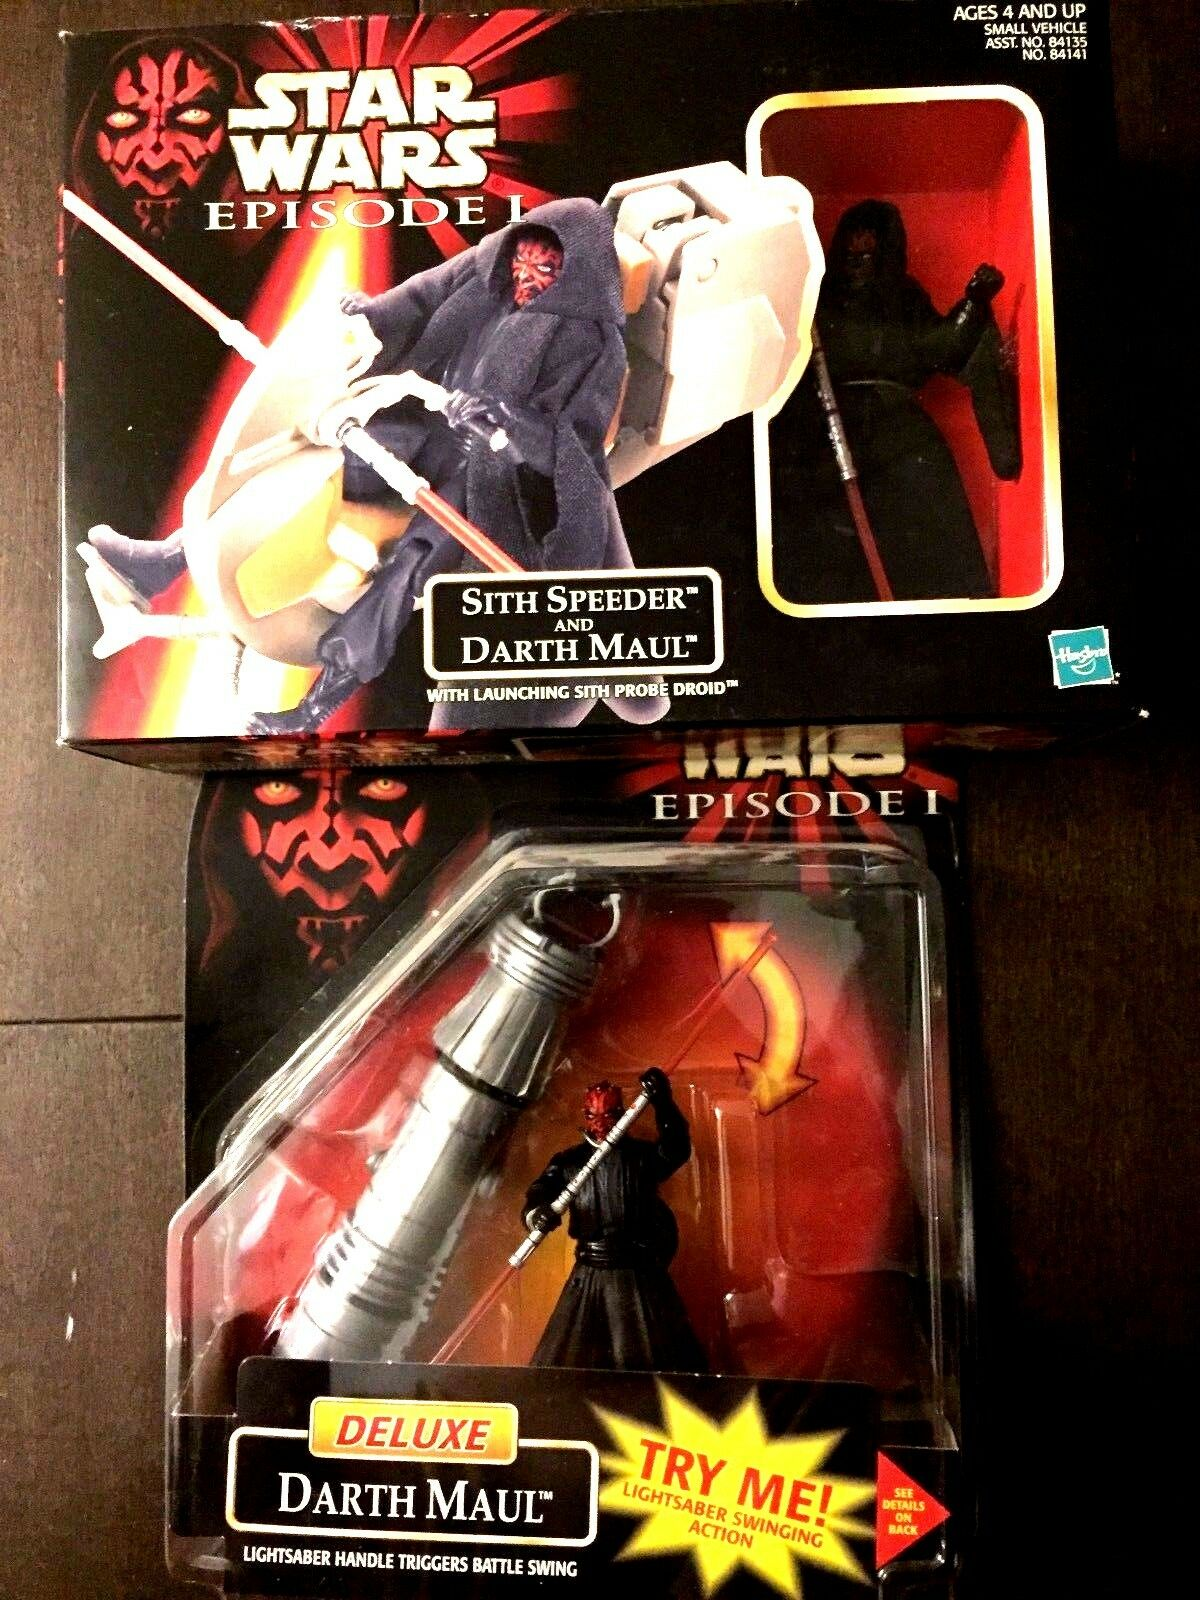 1998 Hasbro Star Wars Episode I Deluxe Darth Maul & Sith Speeder Two Figure Lot